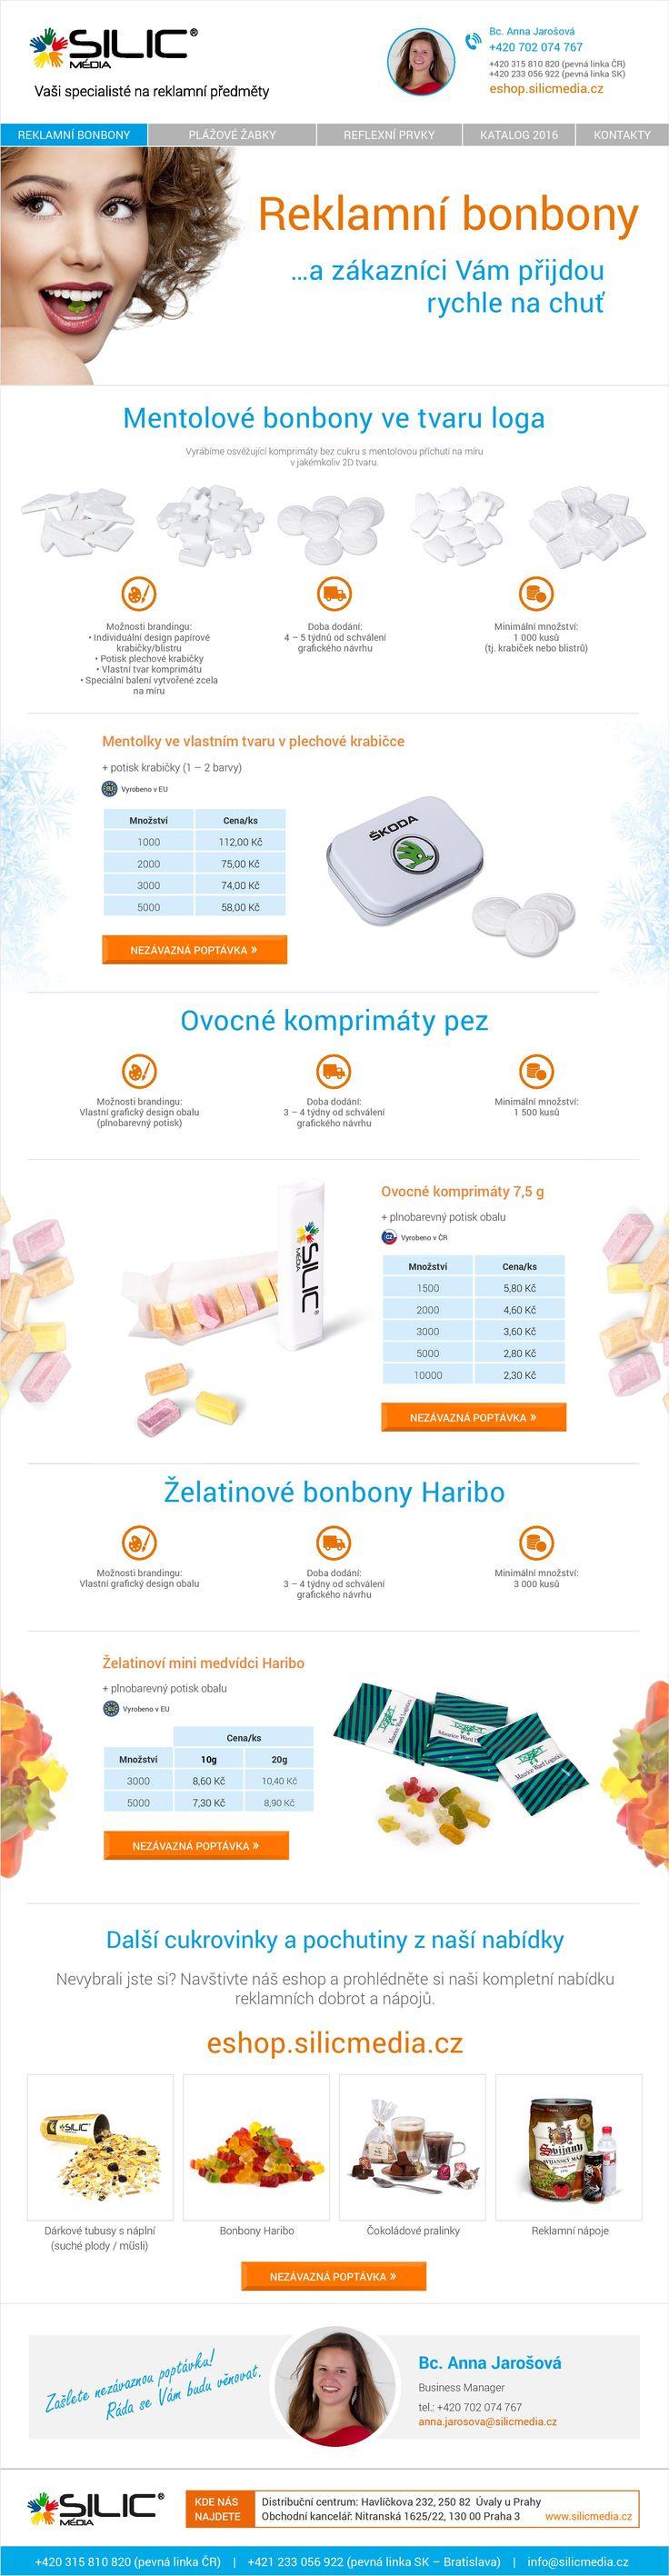 Rozpusťte se zákazníkům na jazyku. http://eshop.silicmedia.cz/aktualni-nabidky?action=detail&bid=191&utm_source=Pinterest&utm_medium=Pin&utm_campaign=Reklamni-bonbony